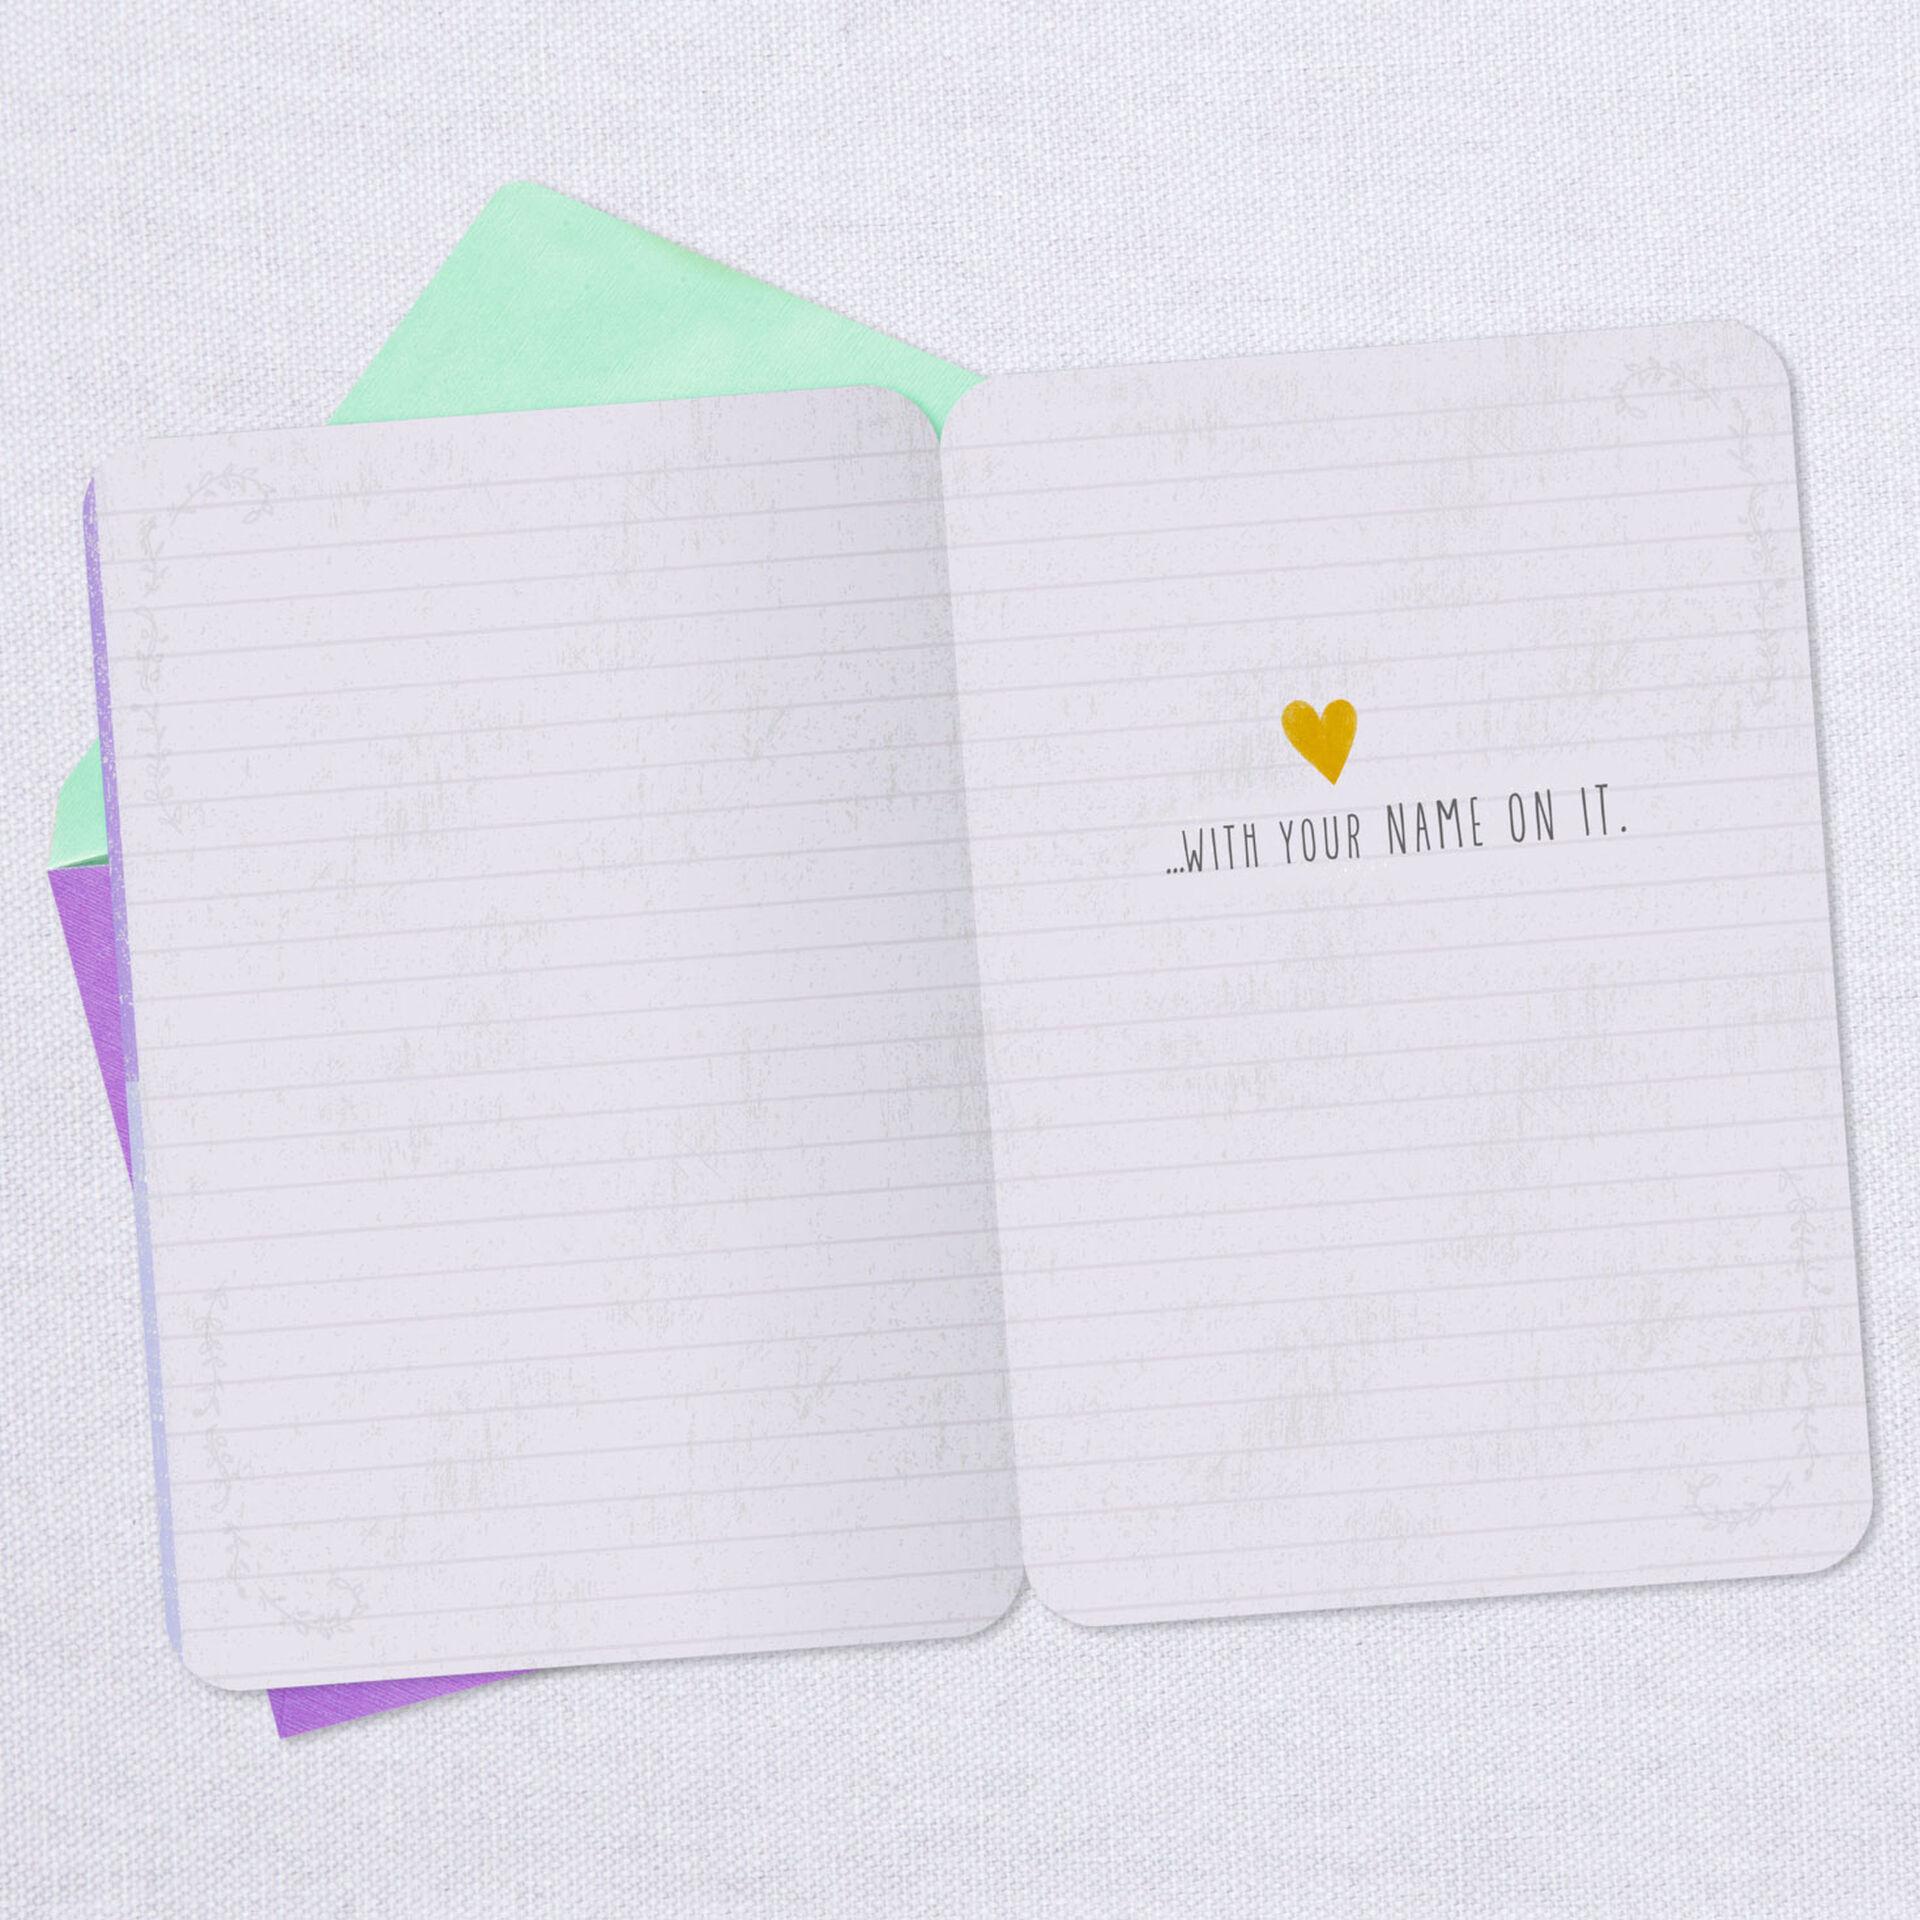 Hallmark Bear Hug Paper Hug Thinking of You Card